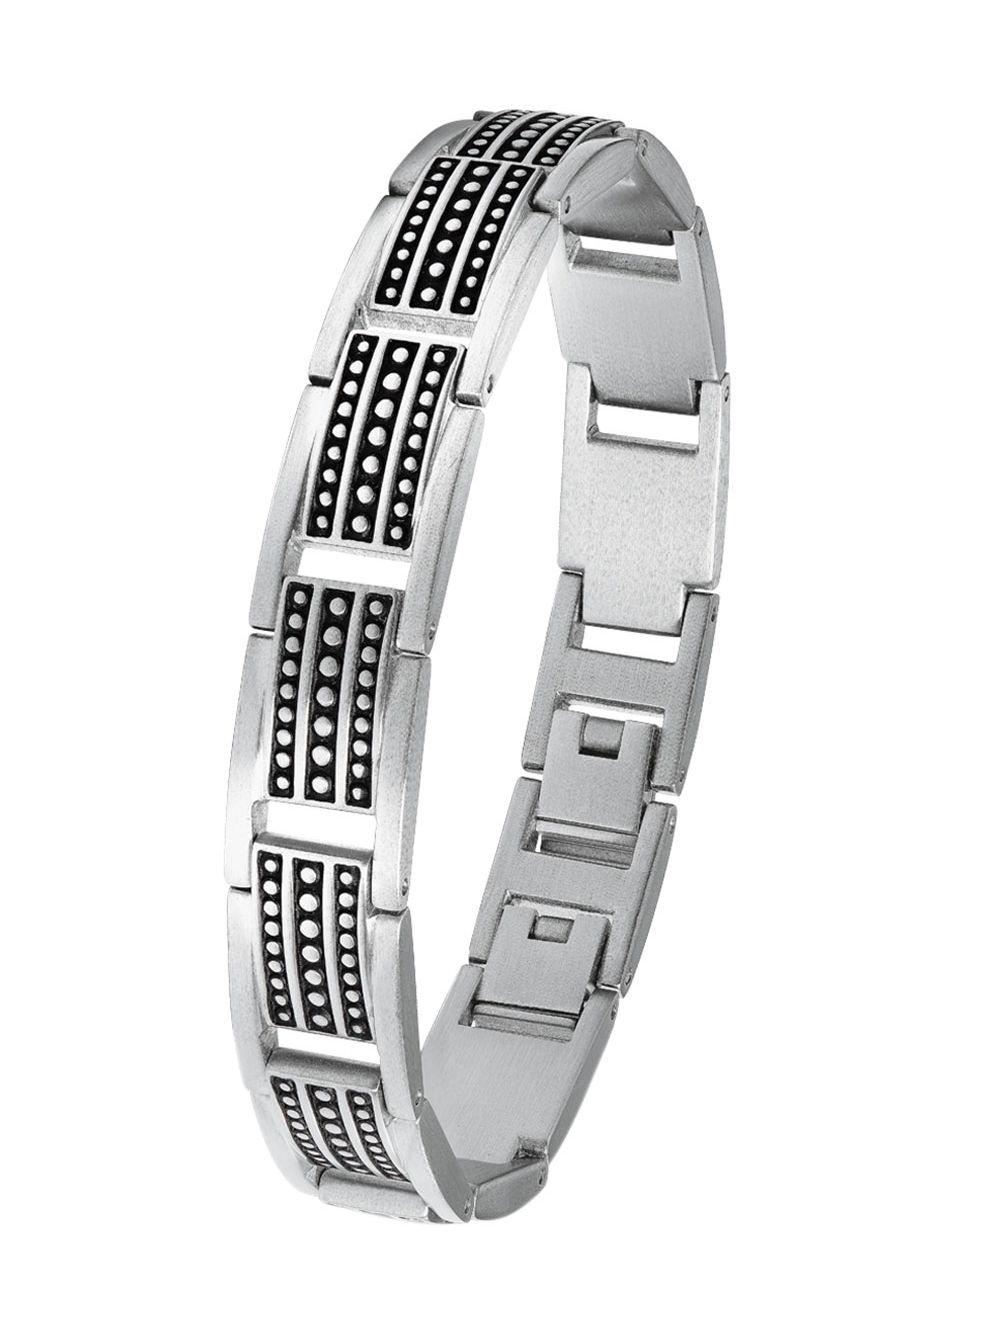 New York besser billiger Verkauf s.Oliver 2022639 Herren-Armband Edelstahl